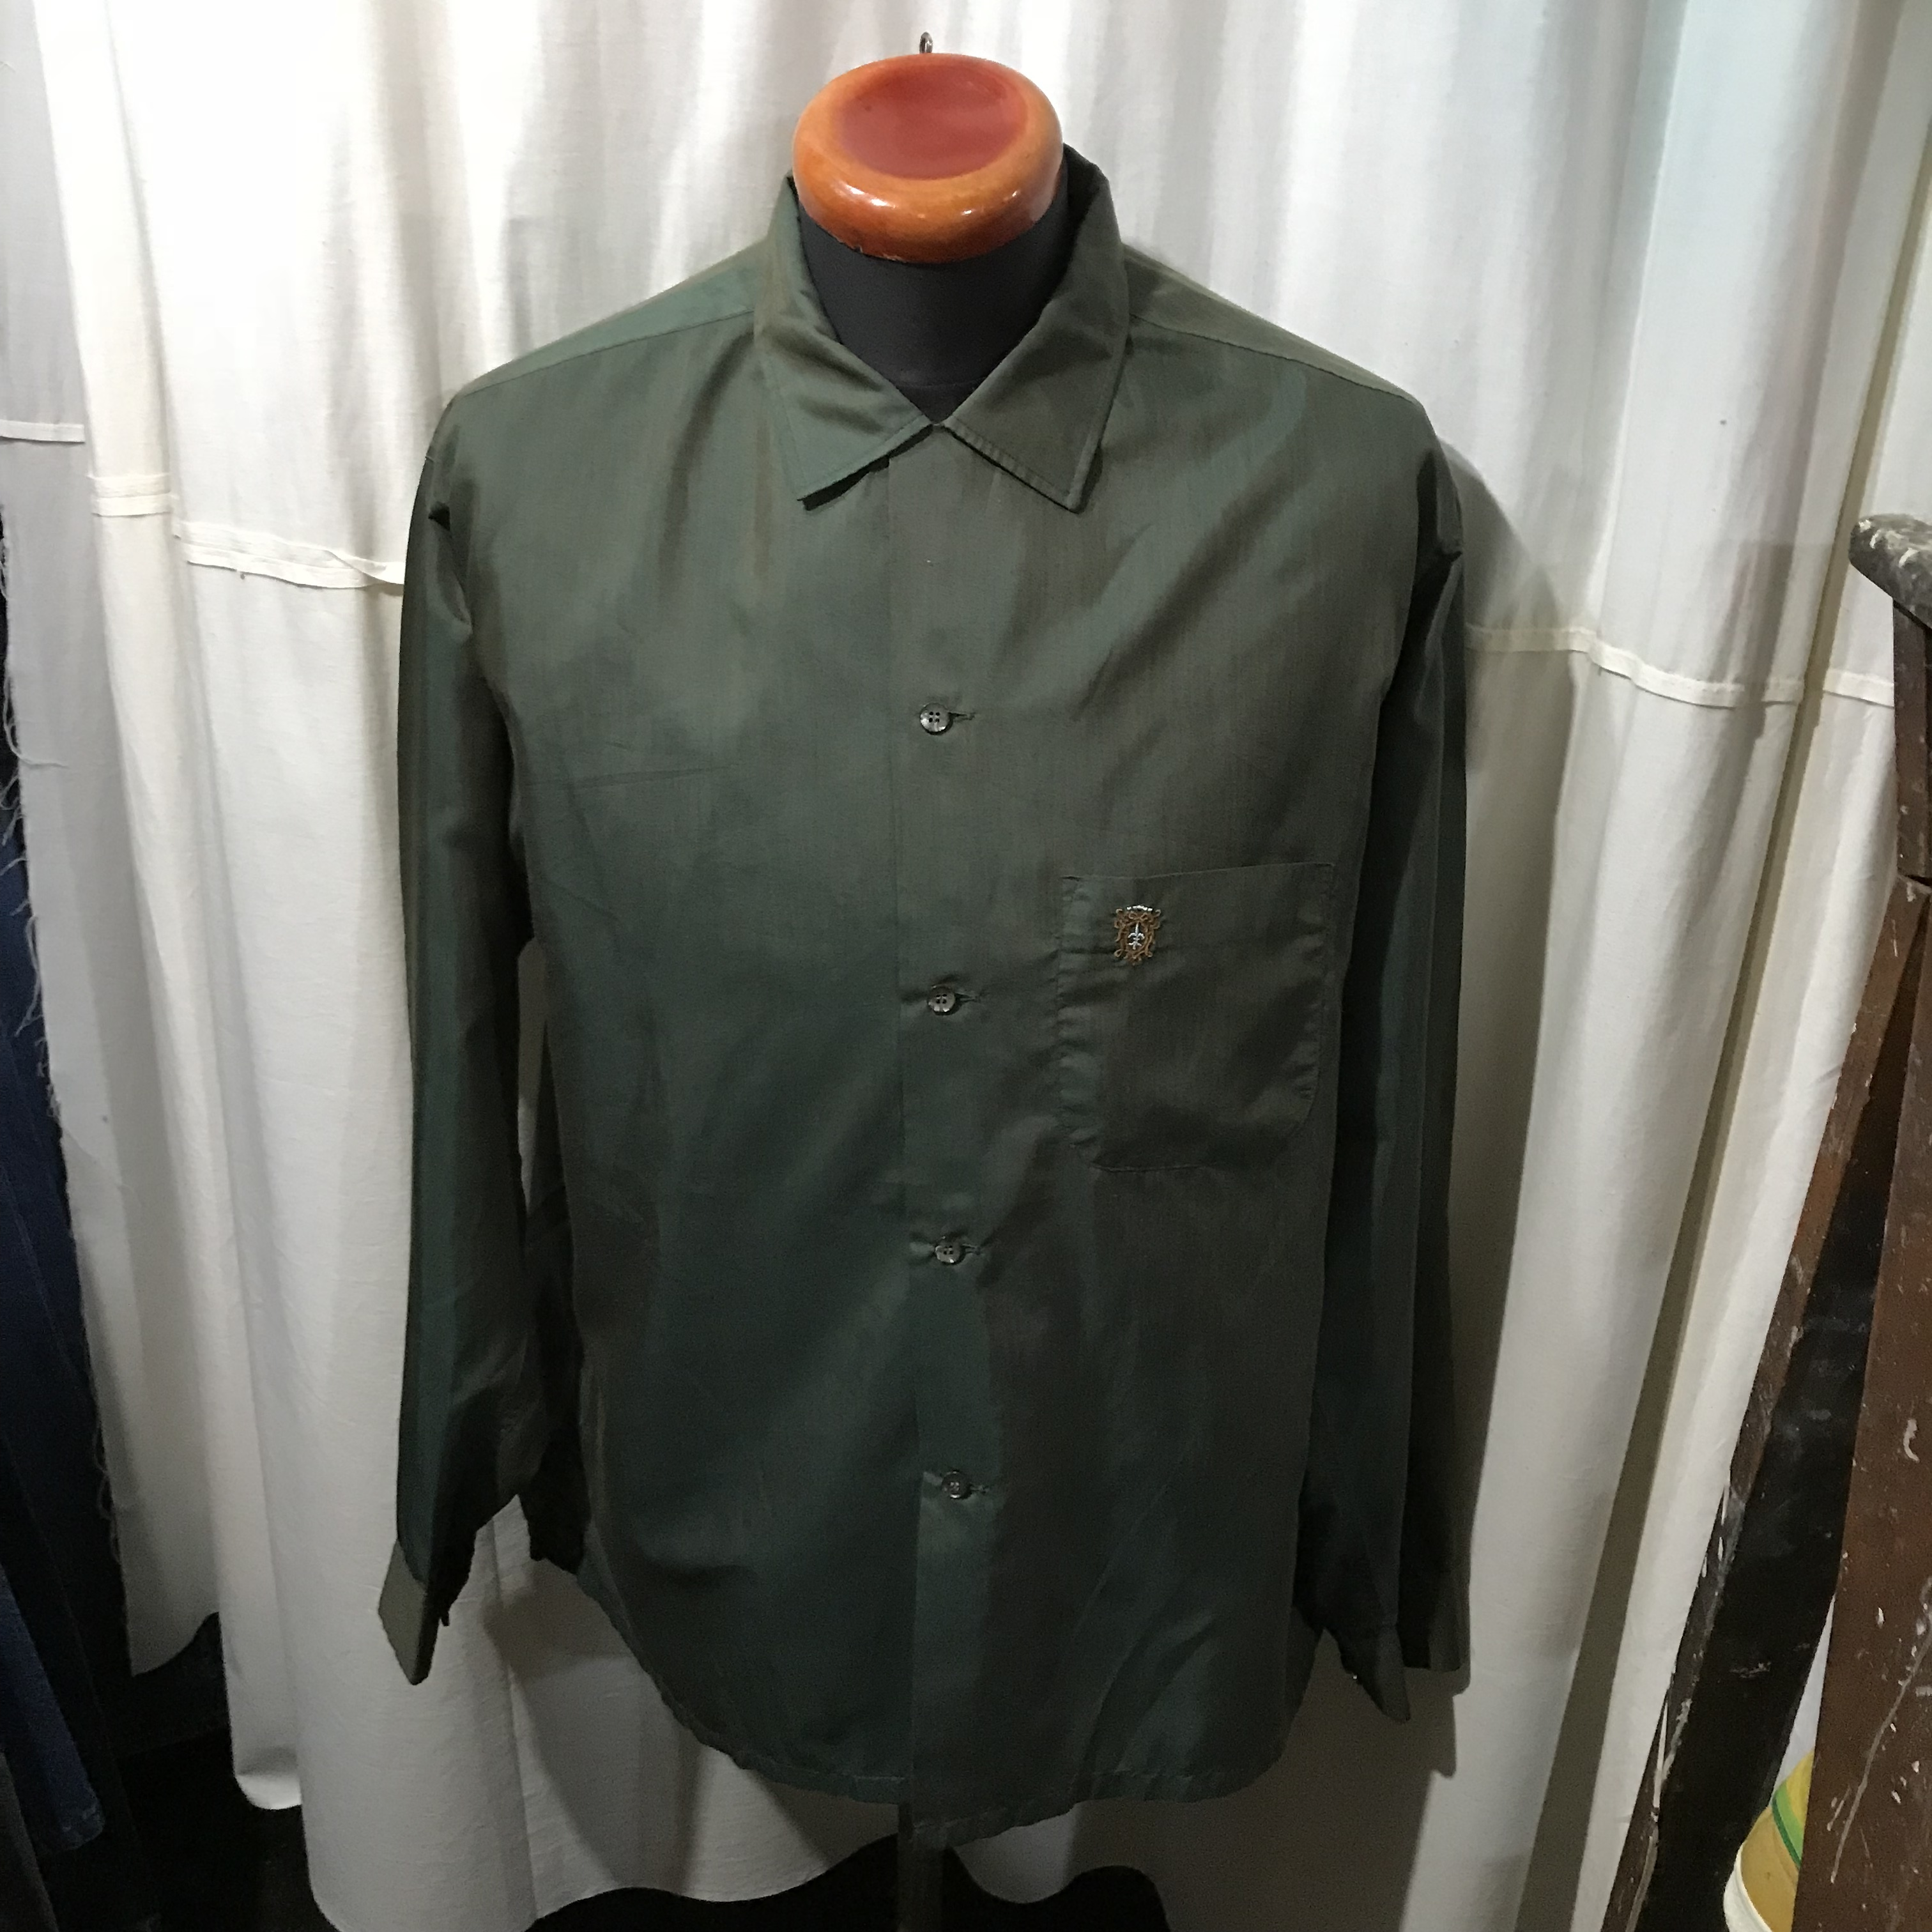 ~60's vintage Penneys TOWNCRAFT ぺニーズ タウンクラフト ボックスシルエットシャツ メンズL~XL